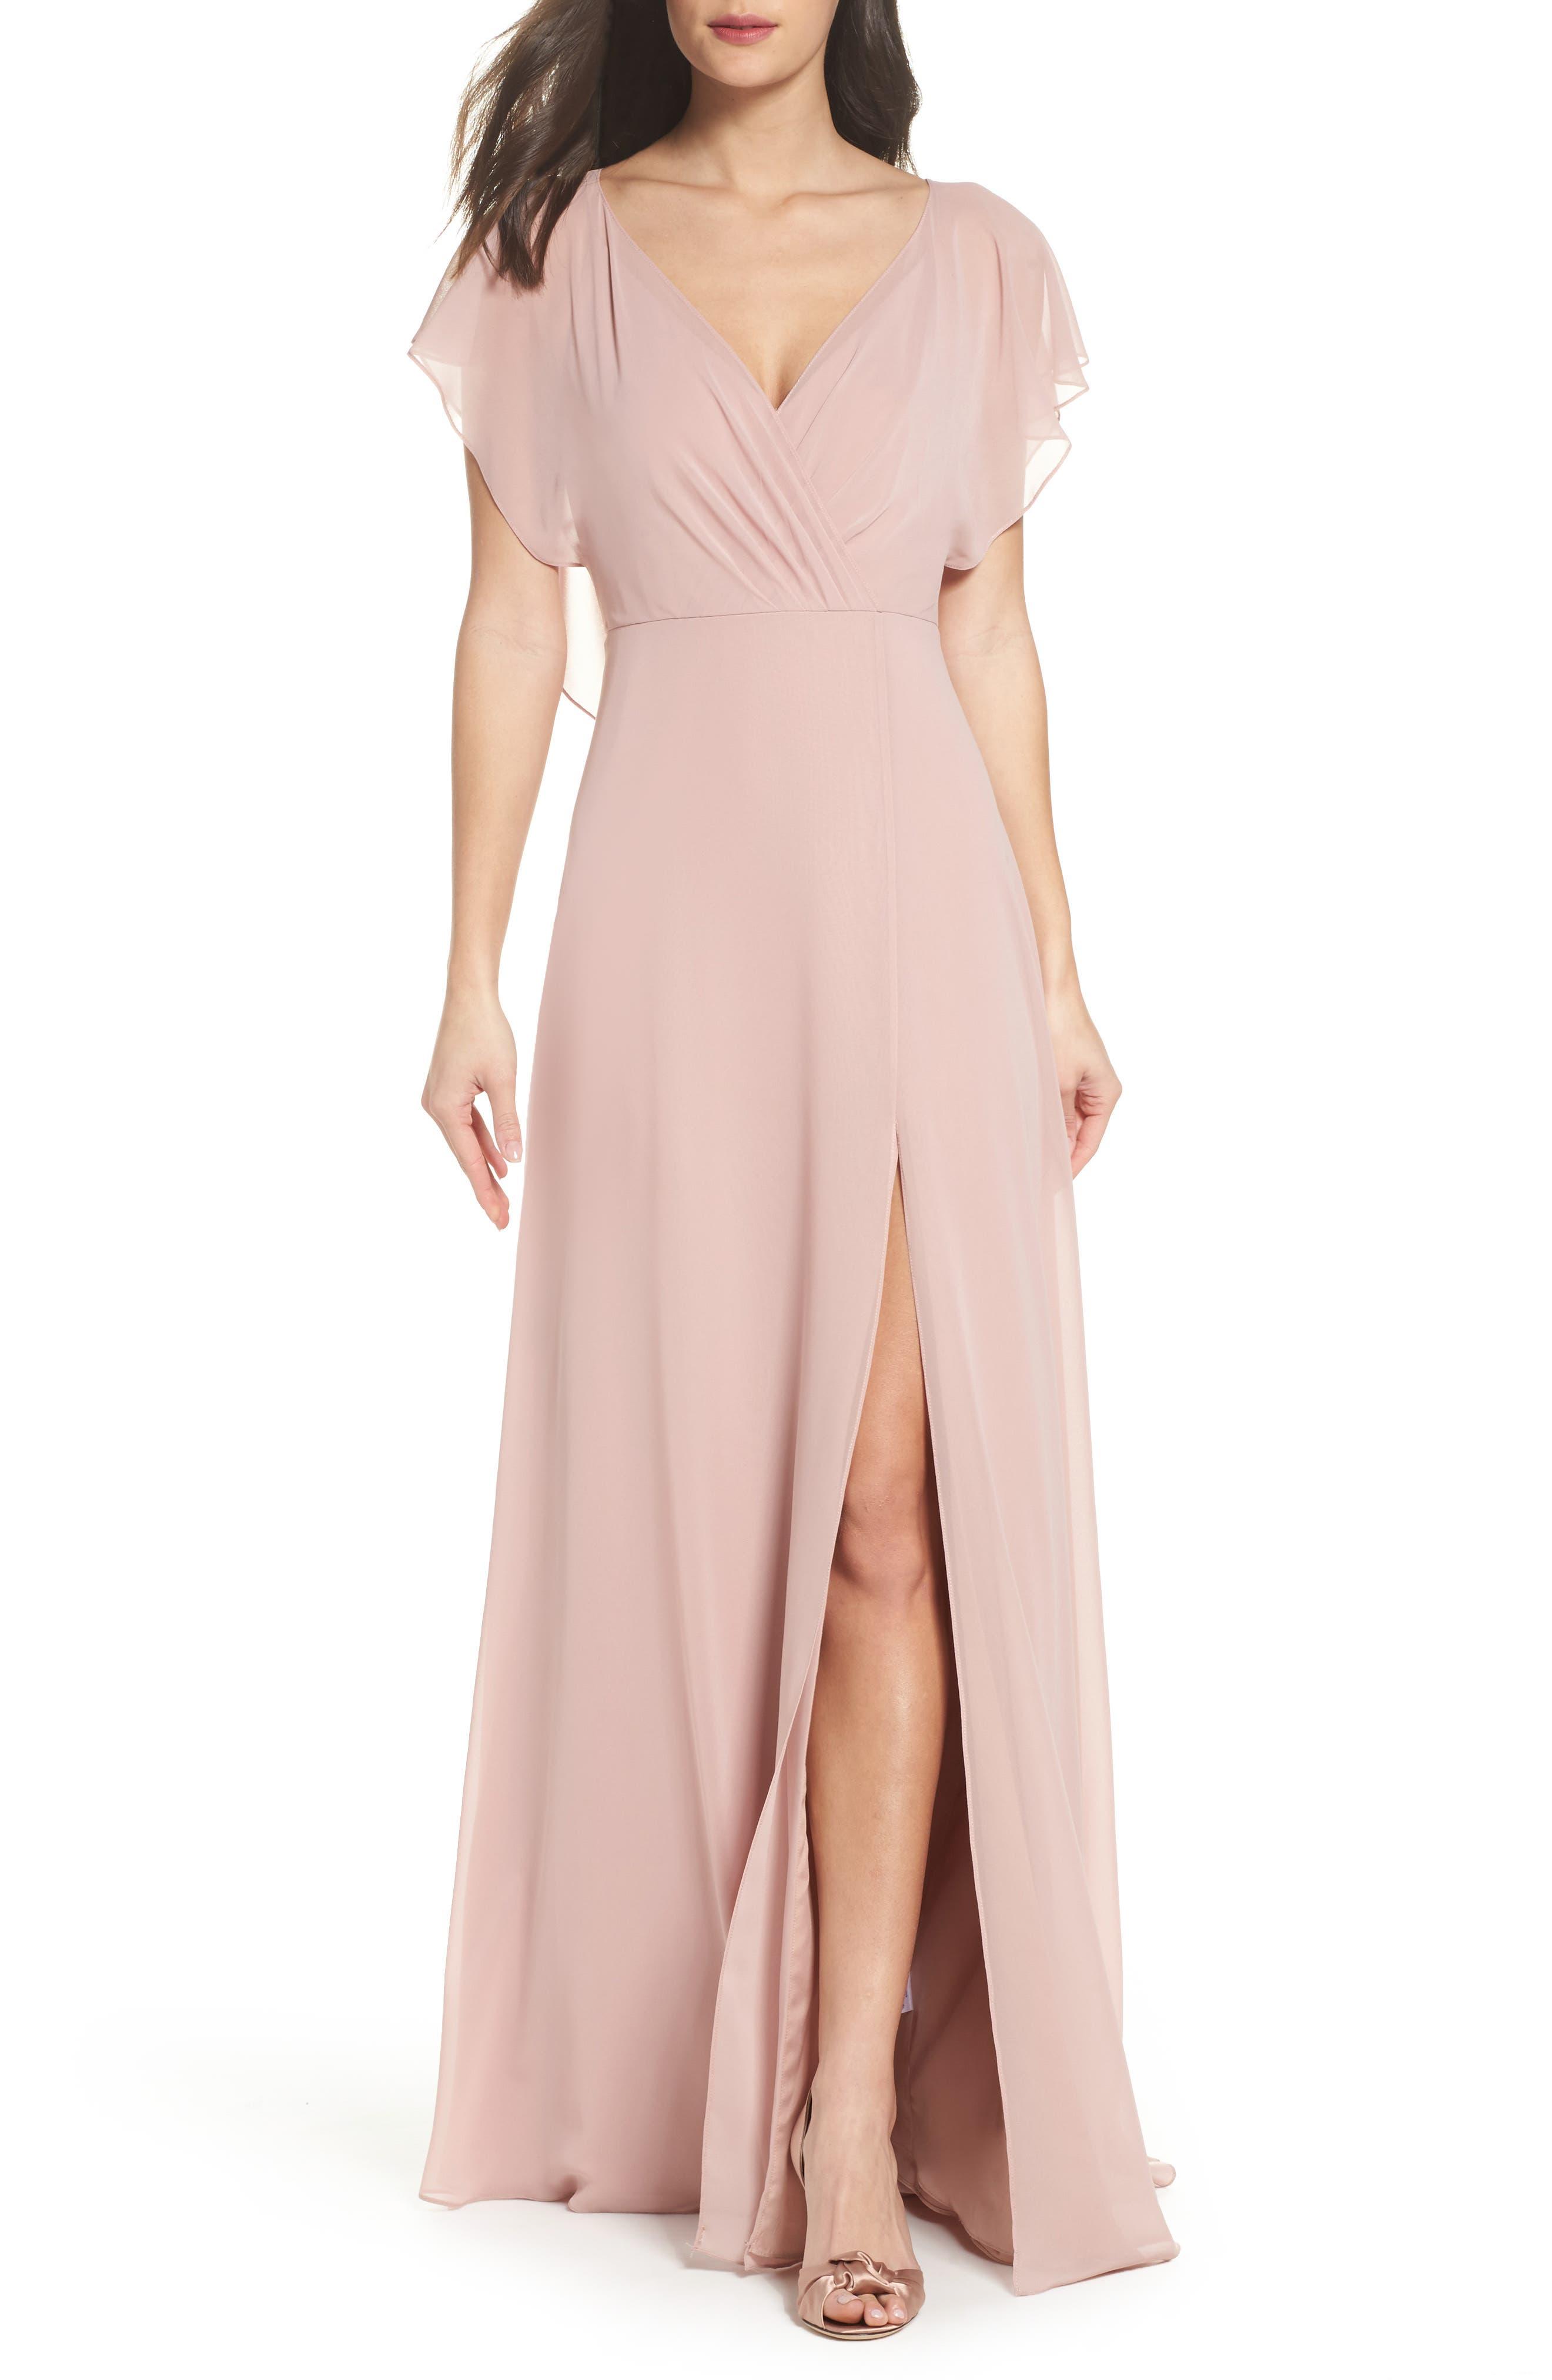 Alternate Image 1 Selected - Jenny Yoo Alanna Open Back Chiffon Gown